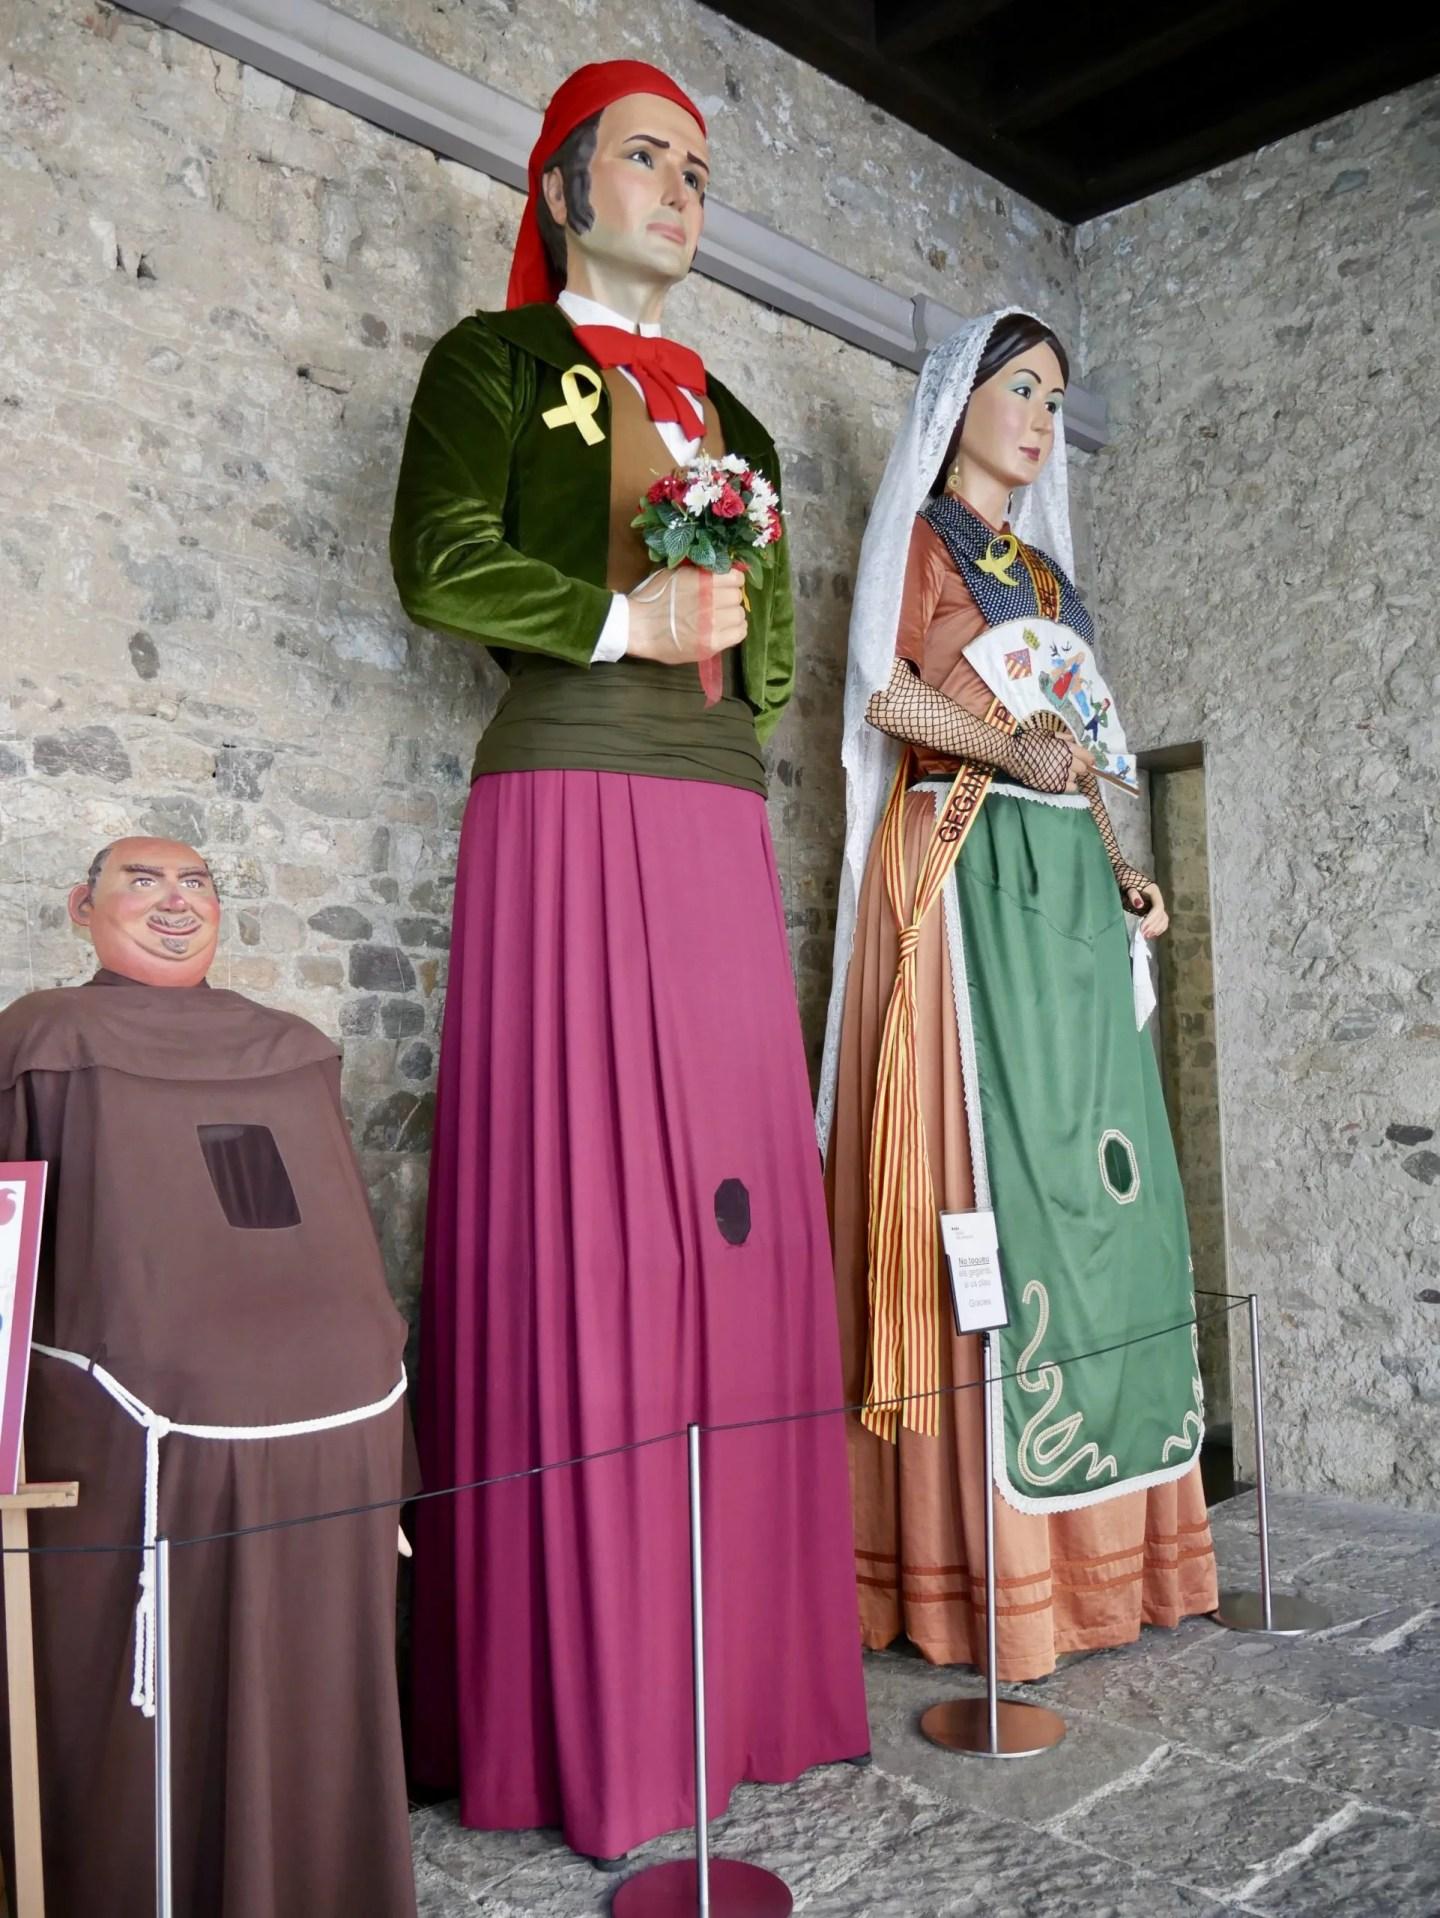 Gegants of Sant Cugat Joan and Marieta